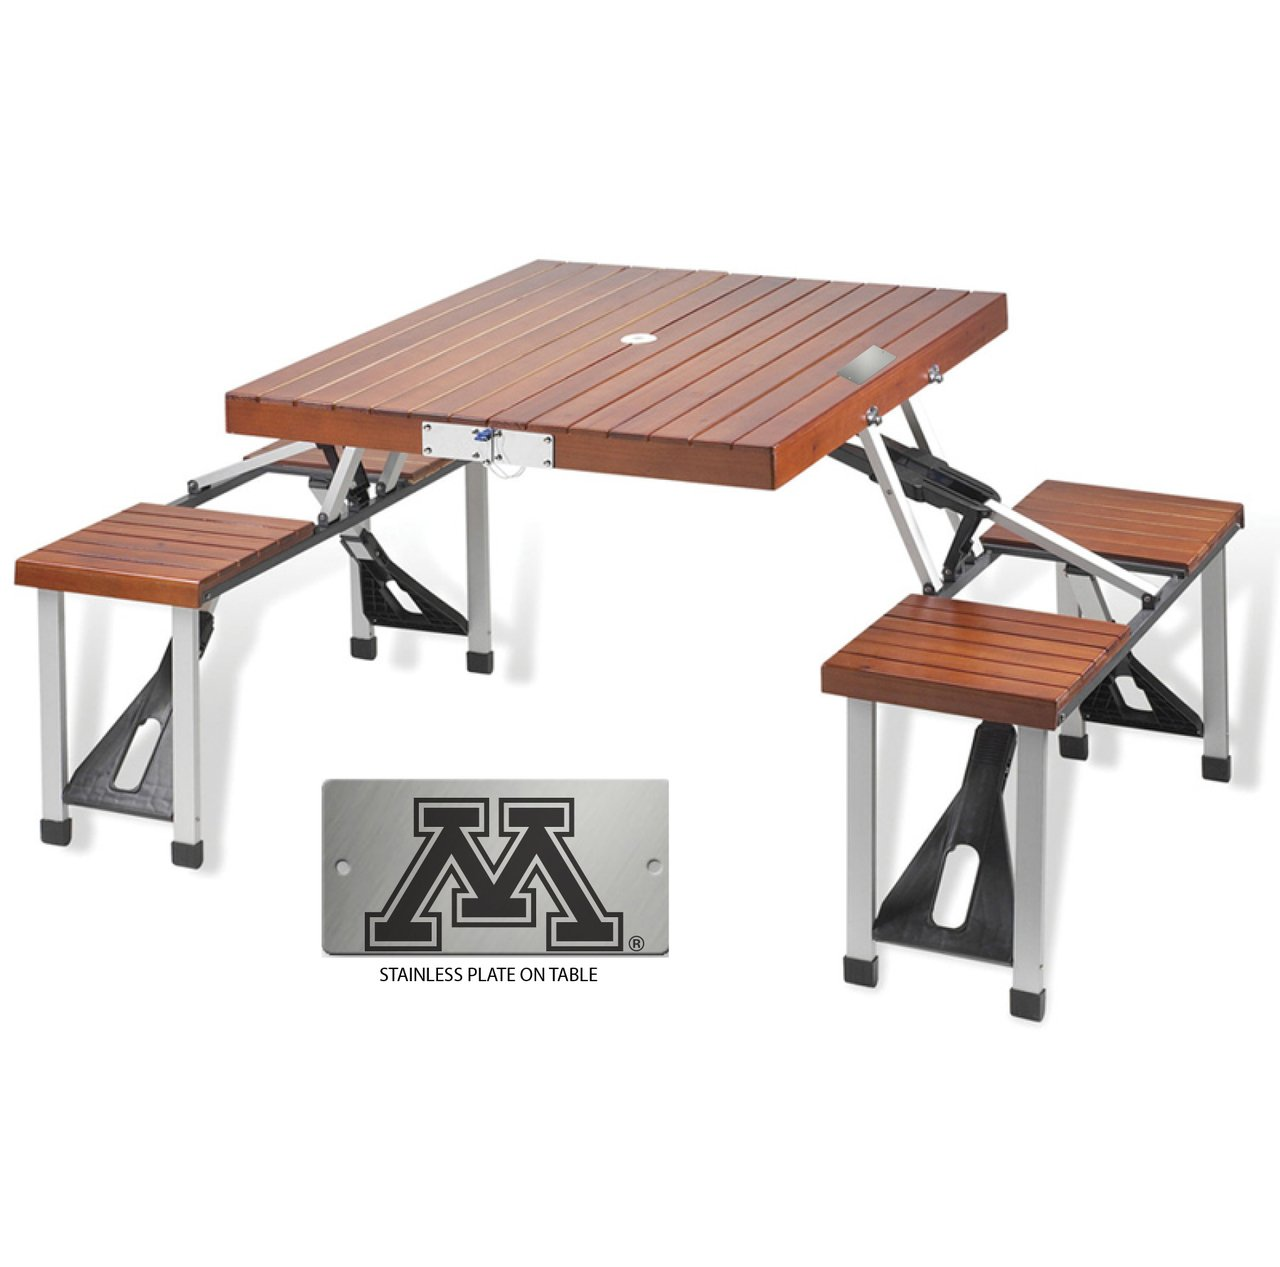 Minnesota Folding Picnic Table for 4